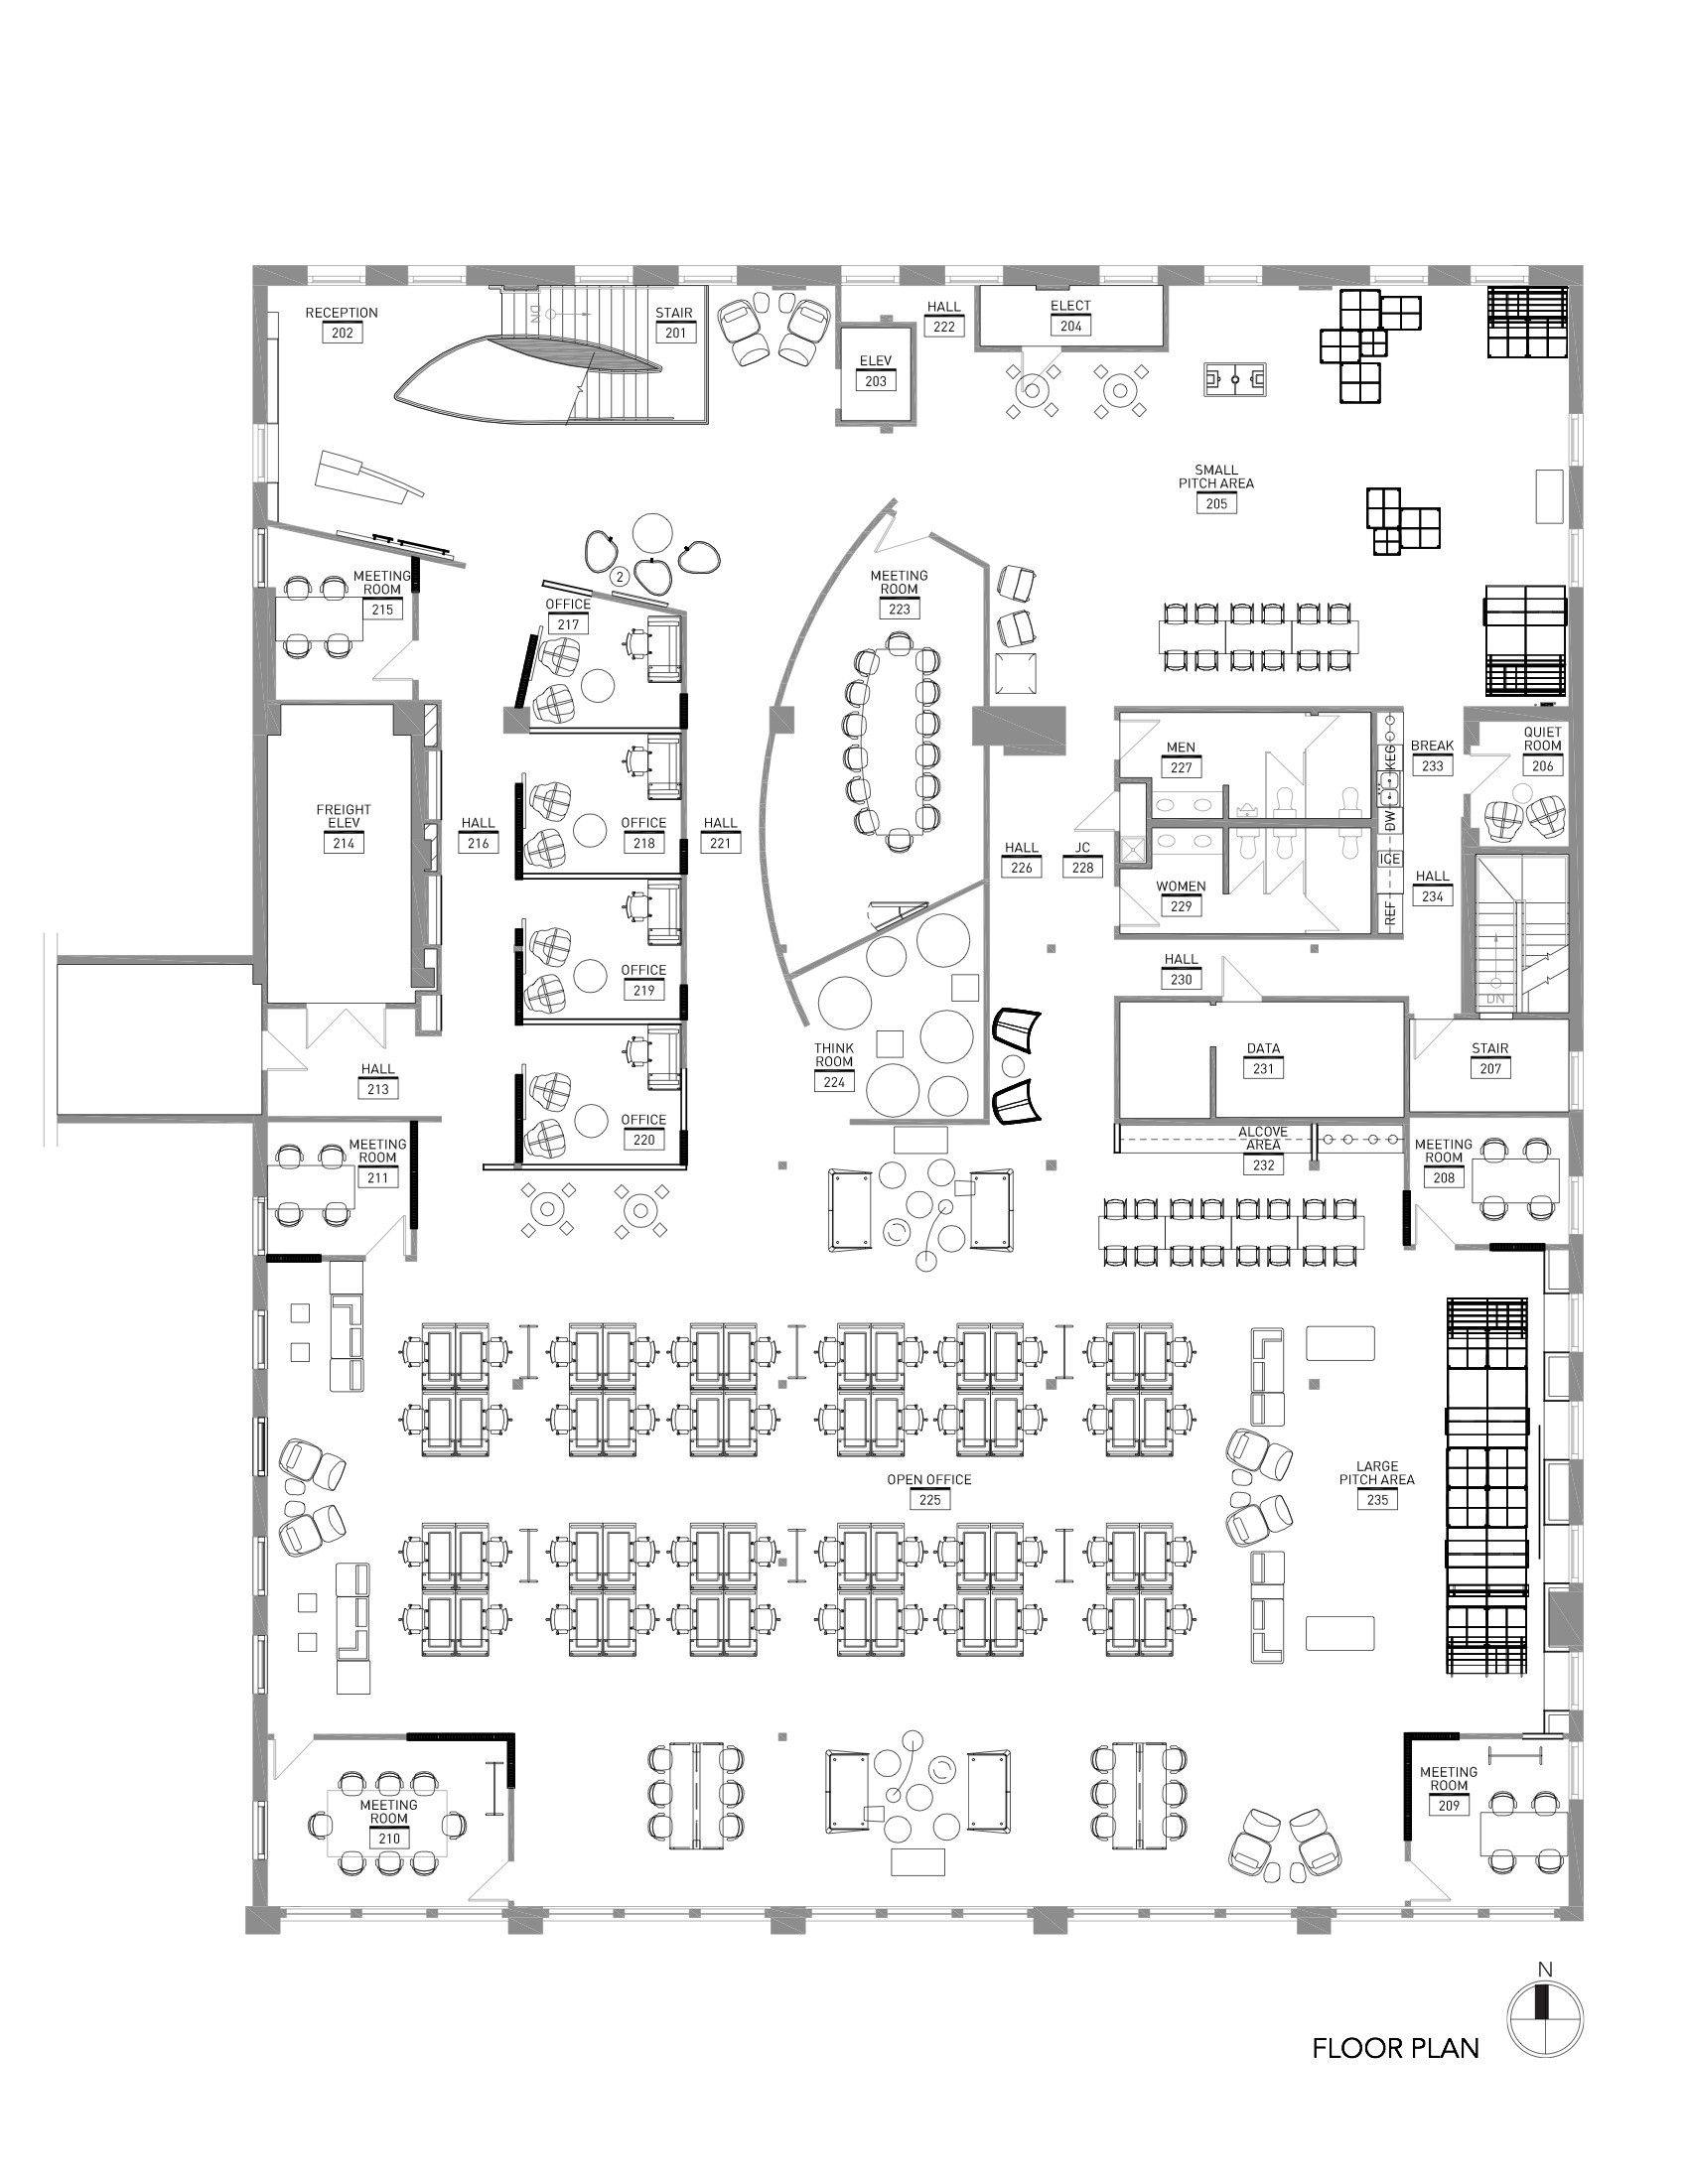 Gallery Of Sprint Accelerator Rmta 12 Office Floor Plan Floor Plan Design Office Layout Plan